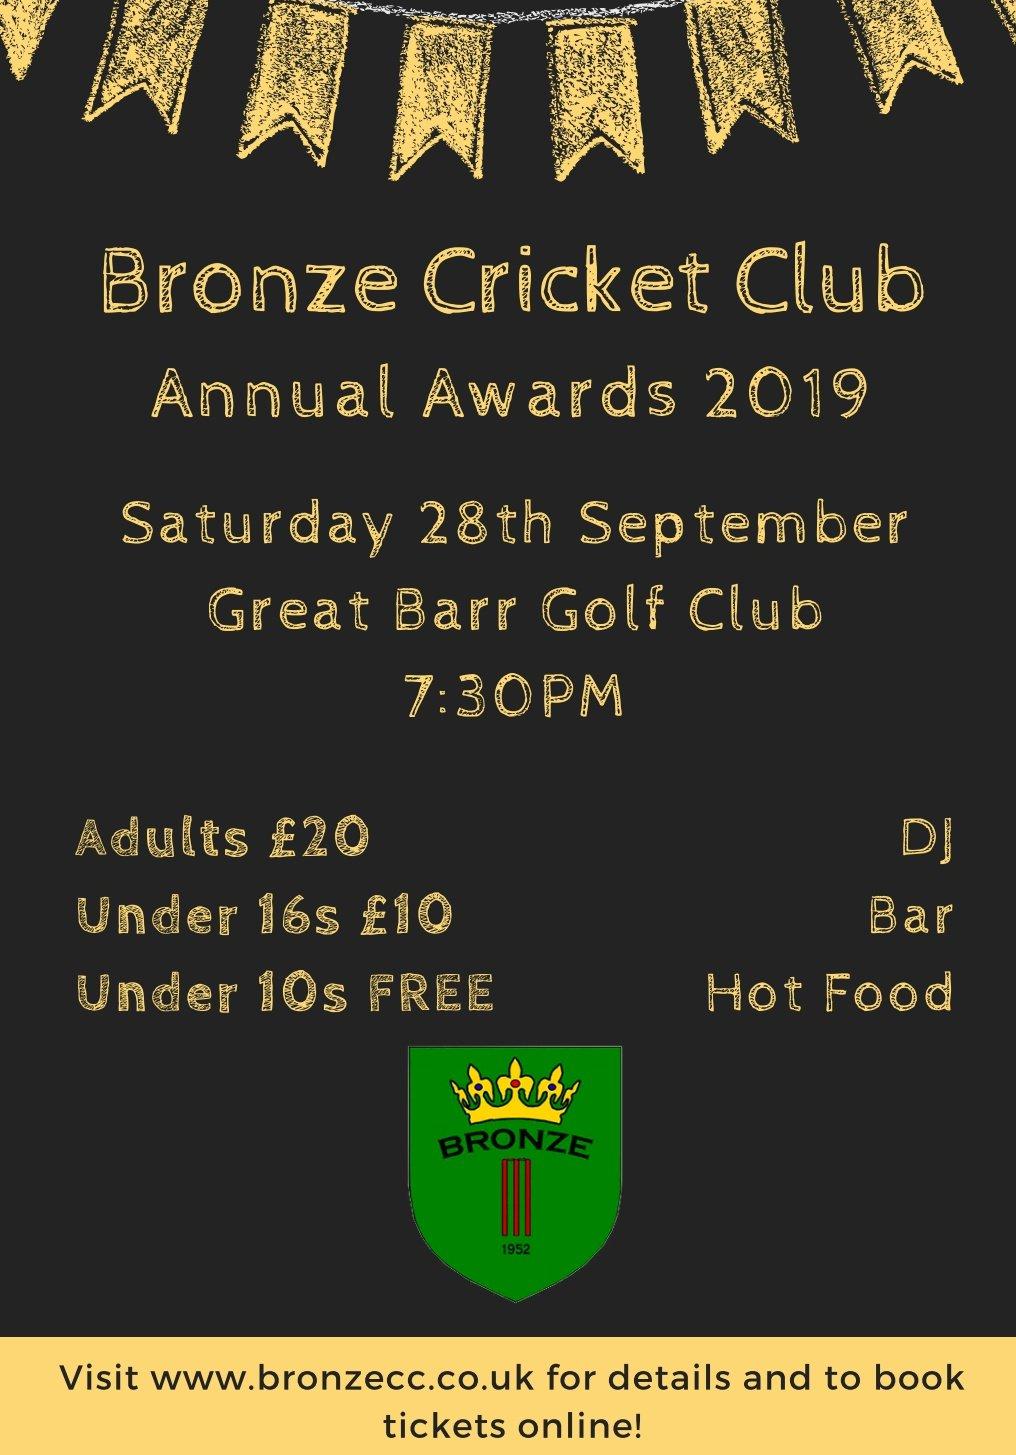 Bronze Cricket Club Annual Awards 2019